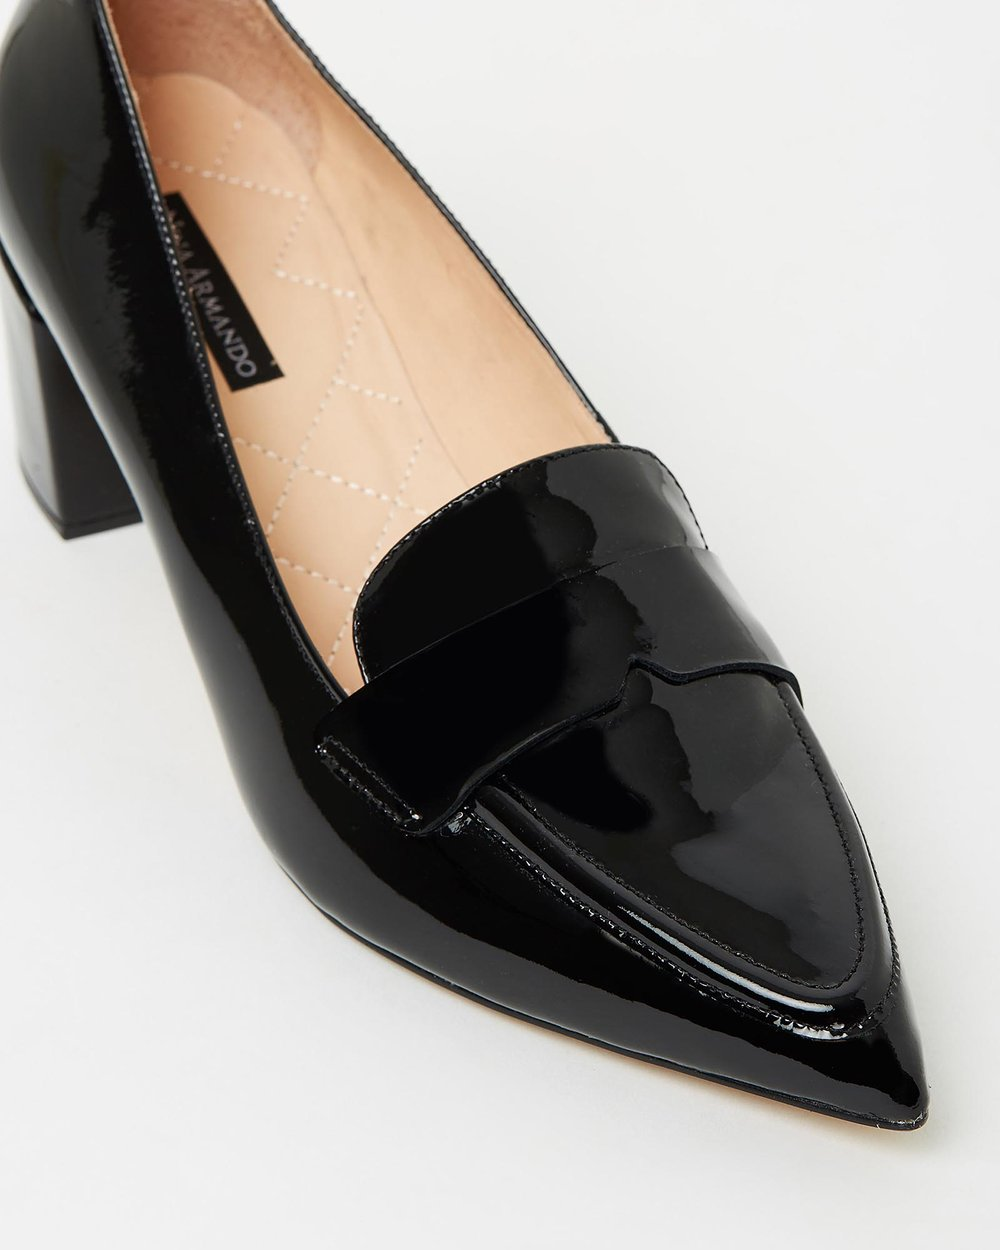 Lesley - Black Patent